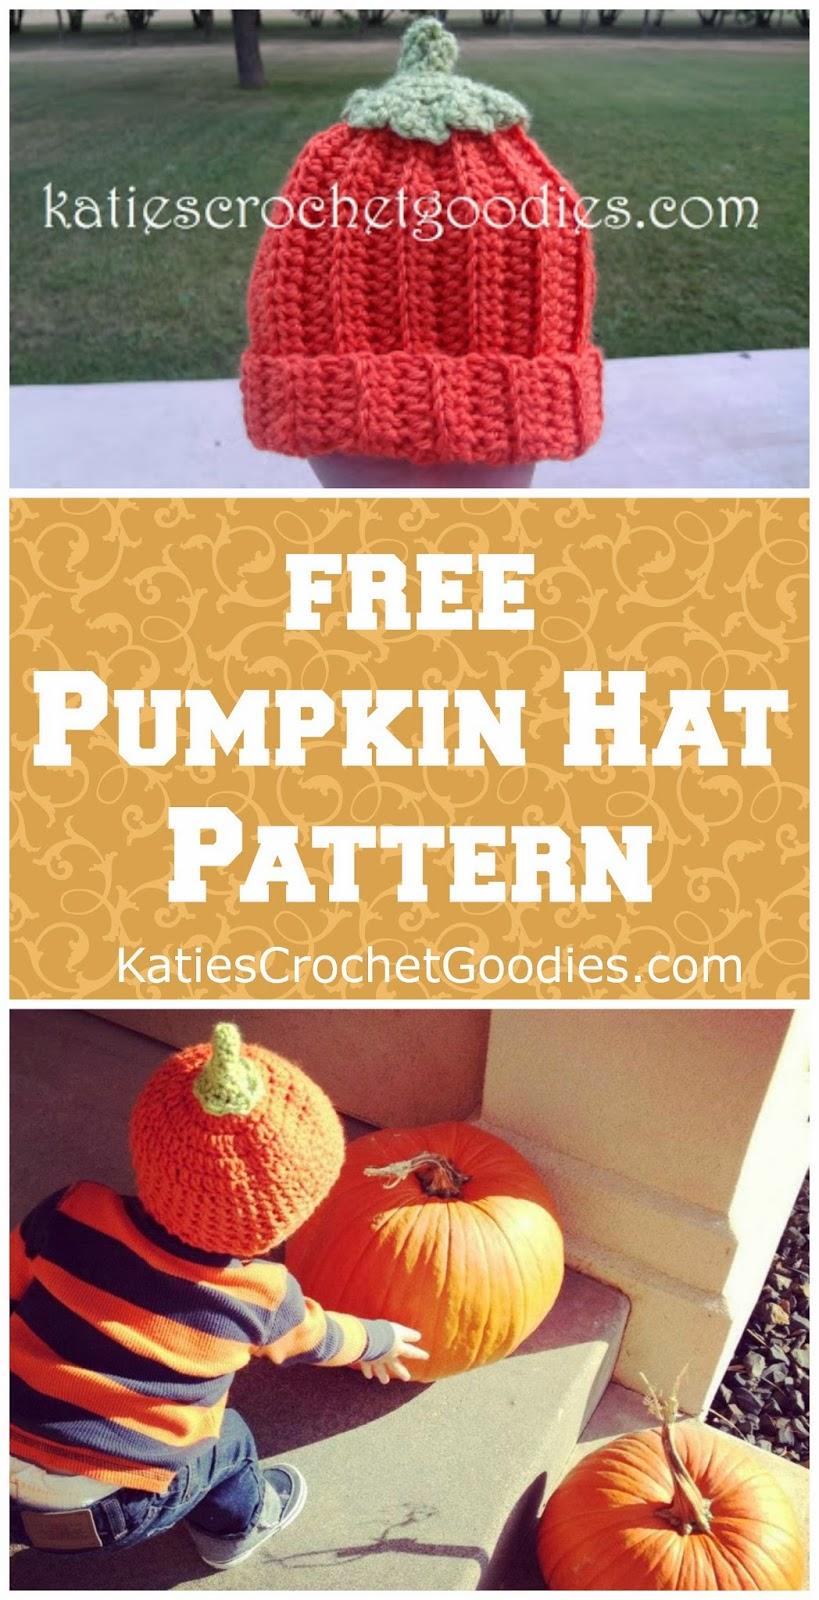 free pumpkin hat pattern